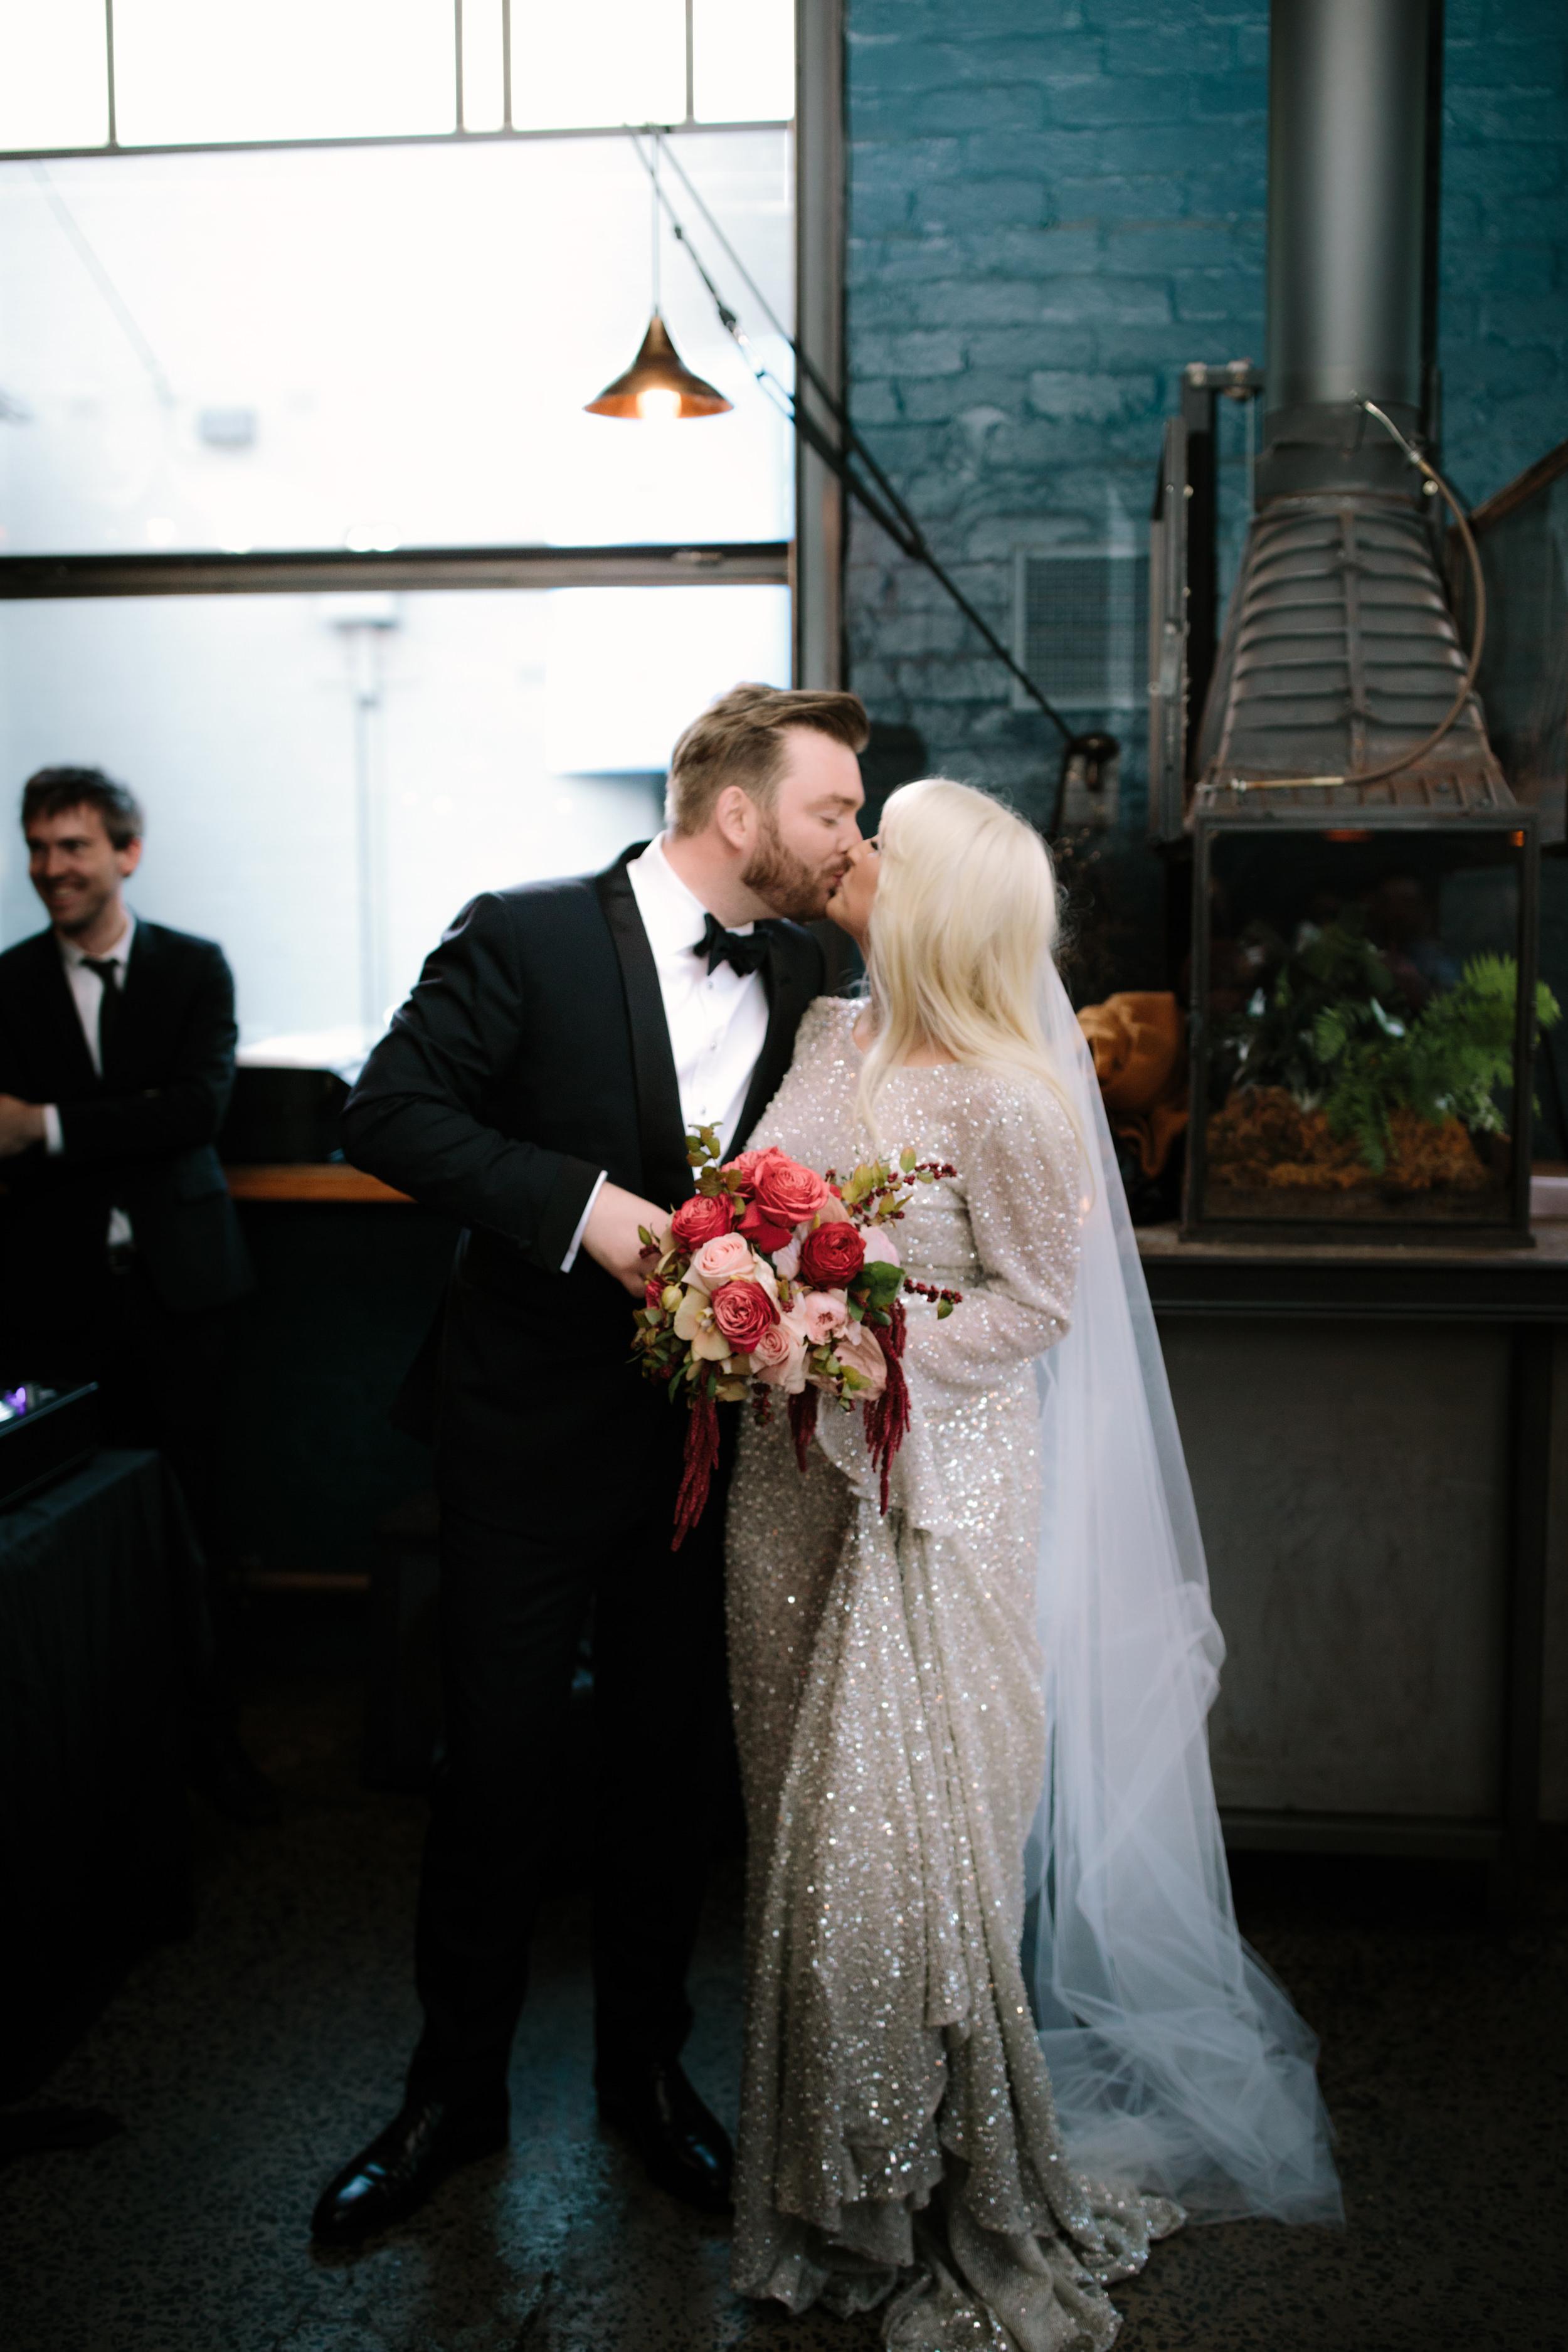 I-Got-You-Babe-Weddings-Tori-Will-Rupert0143.JPG